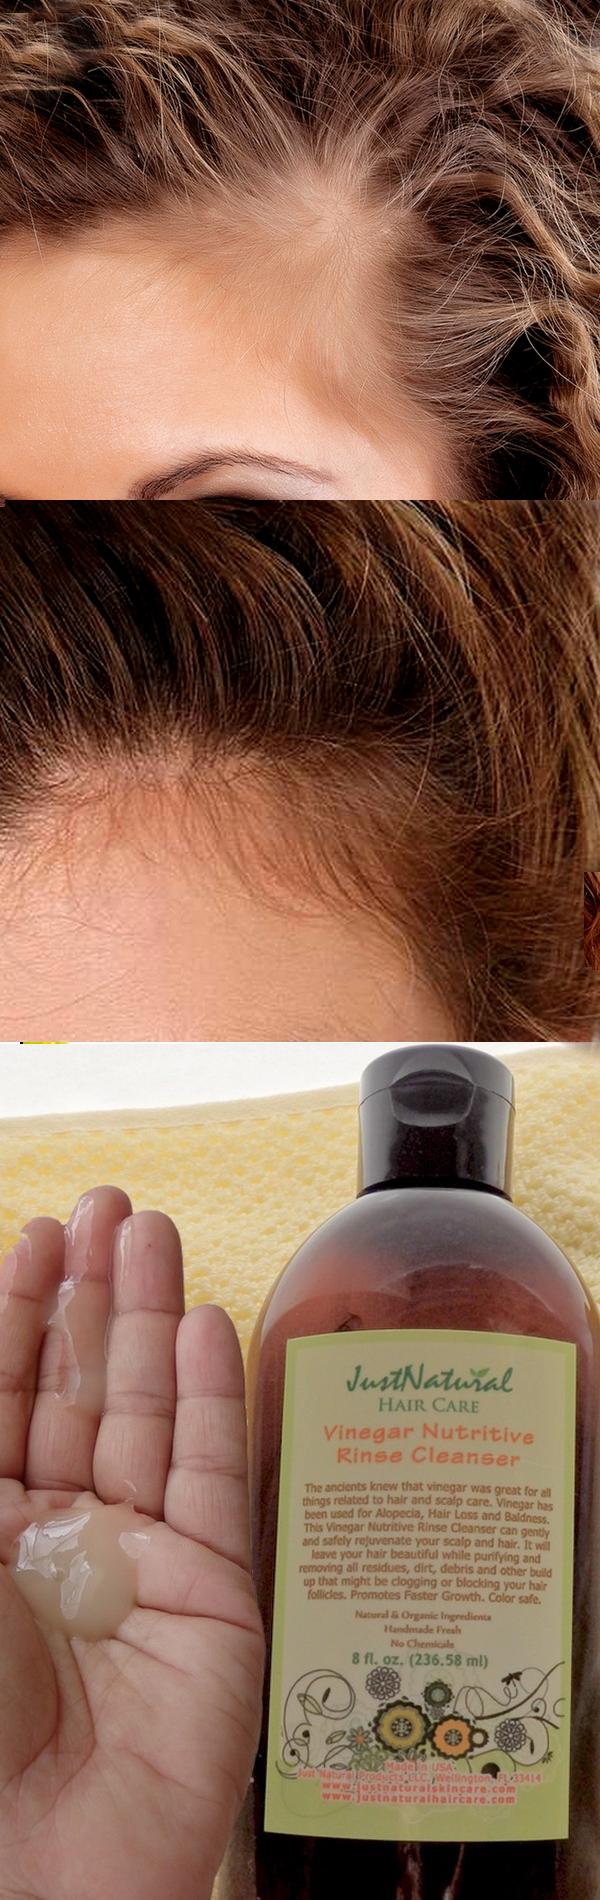 Vinegar Nutritive Rinse Cleanser Hair beauty__cat__